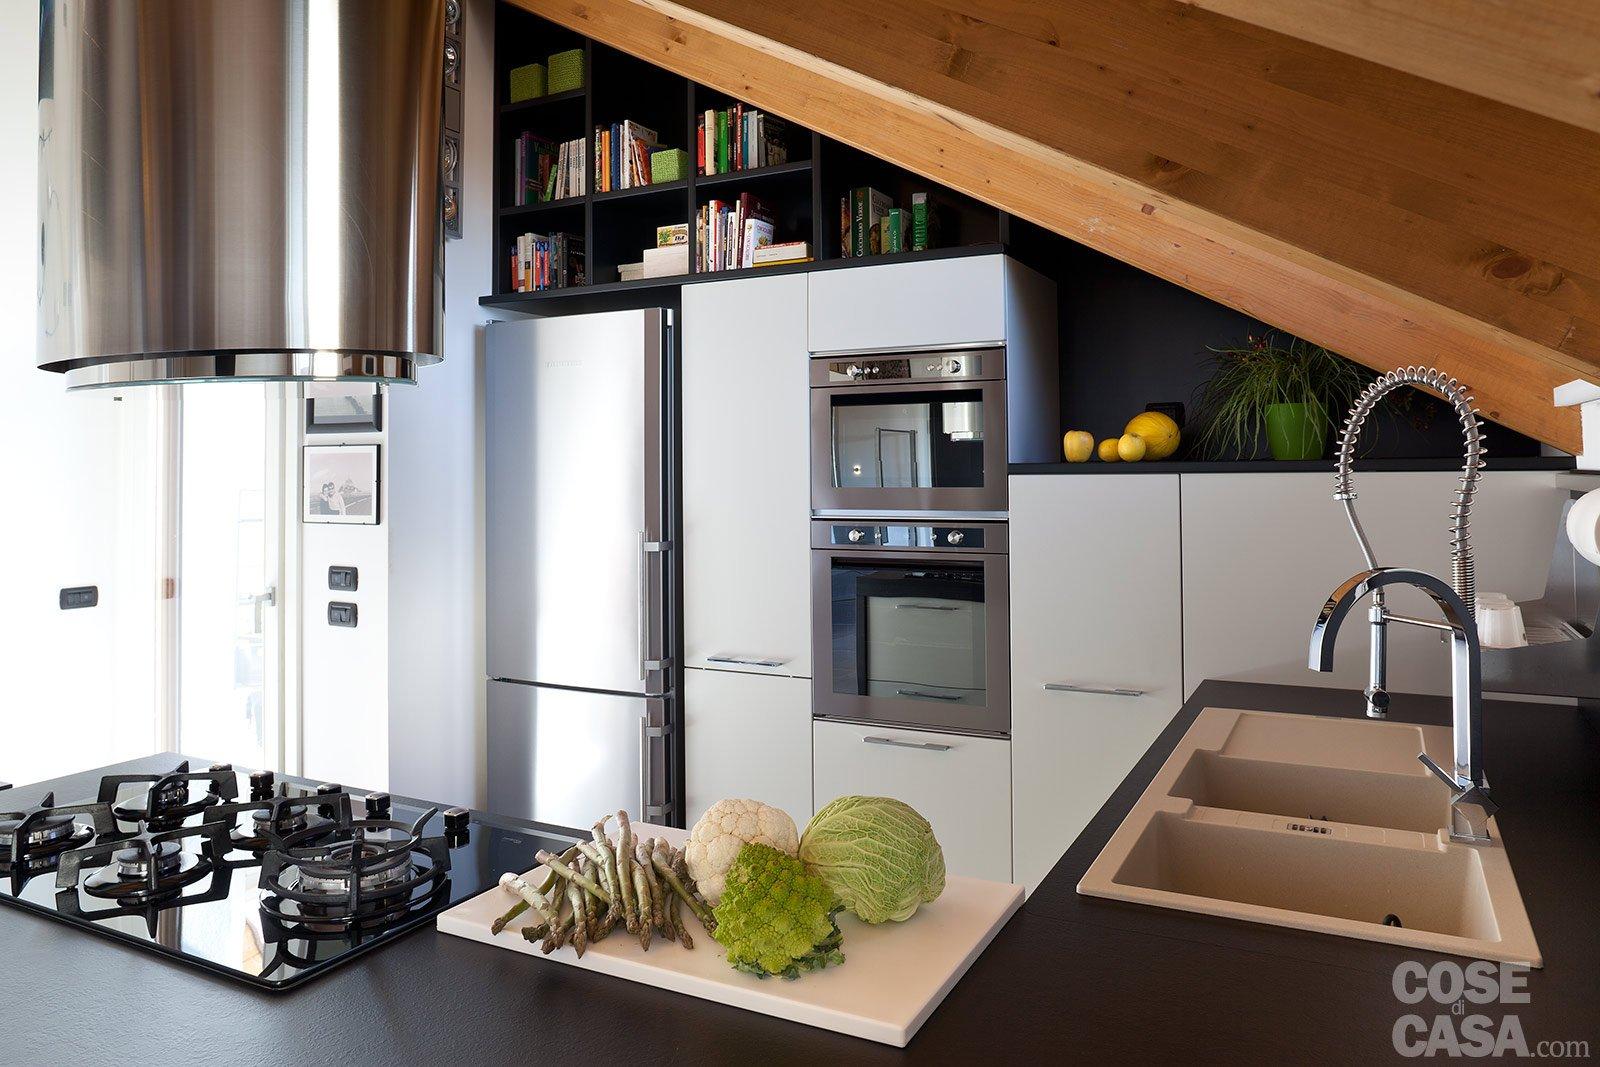 90 10 mq per una casa che sfrutta bene gli spazi cose di - Cucina in casa ...